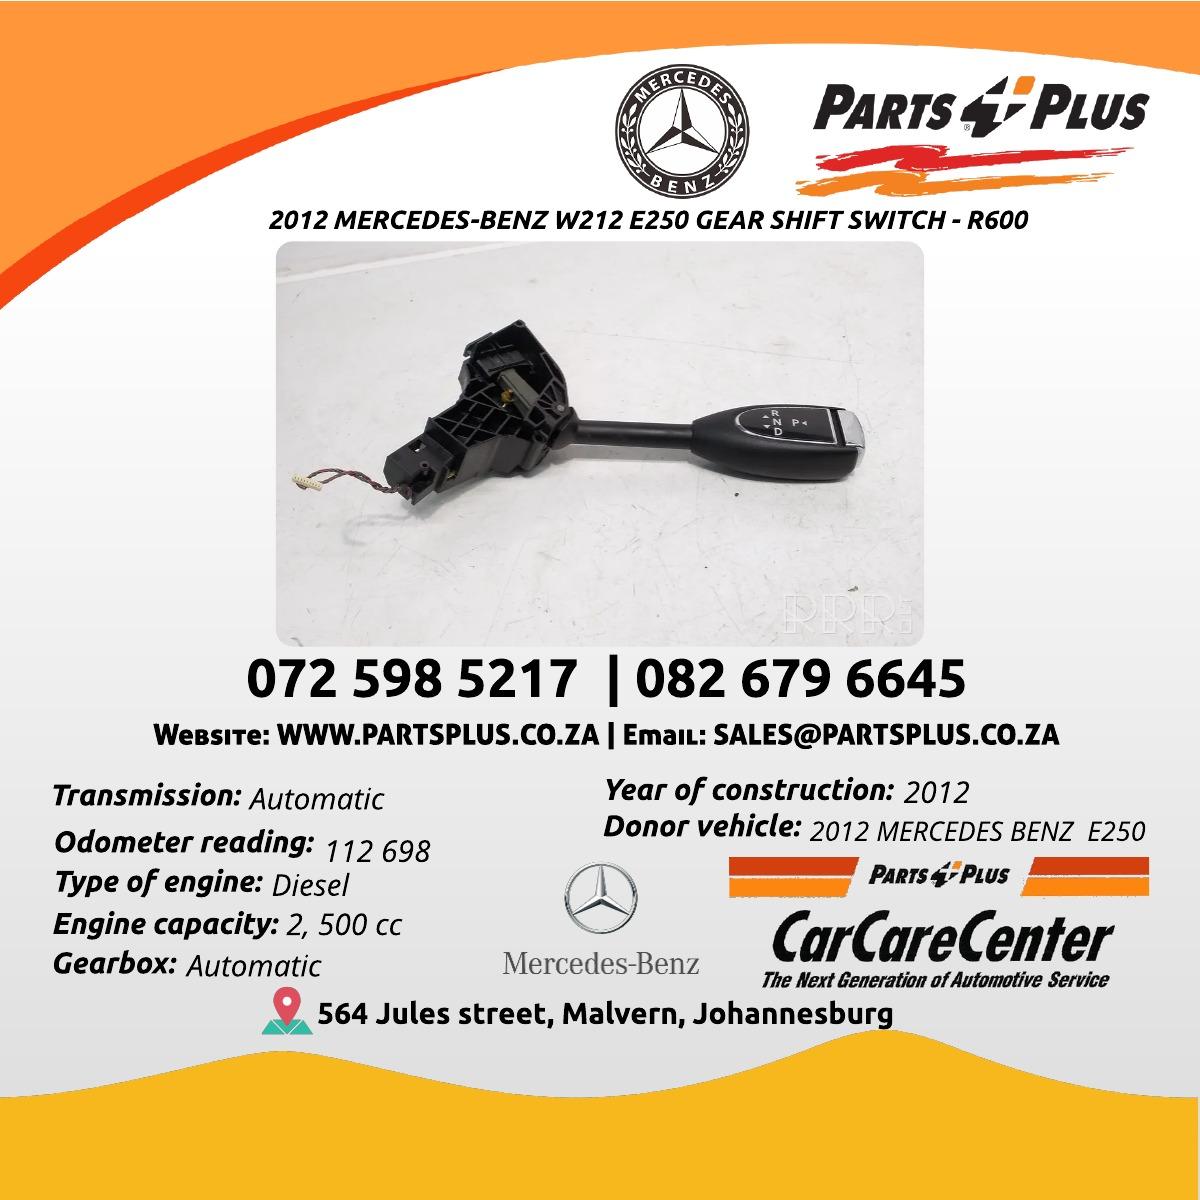 2012 MERCEDES-BENZ W212 E250 GEAR SHIFT SWITCH